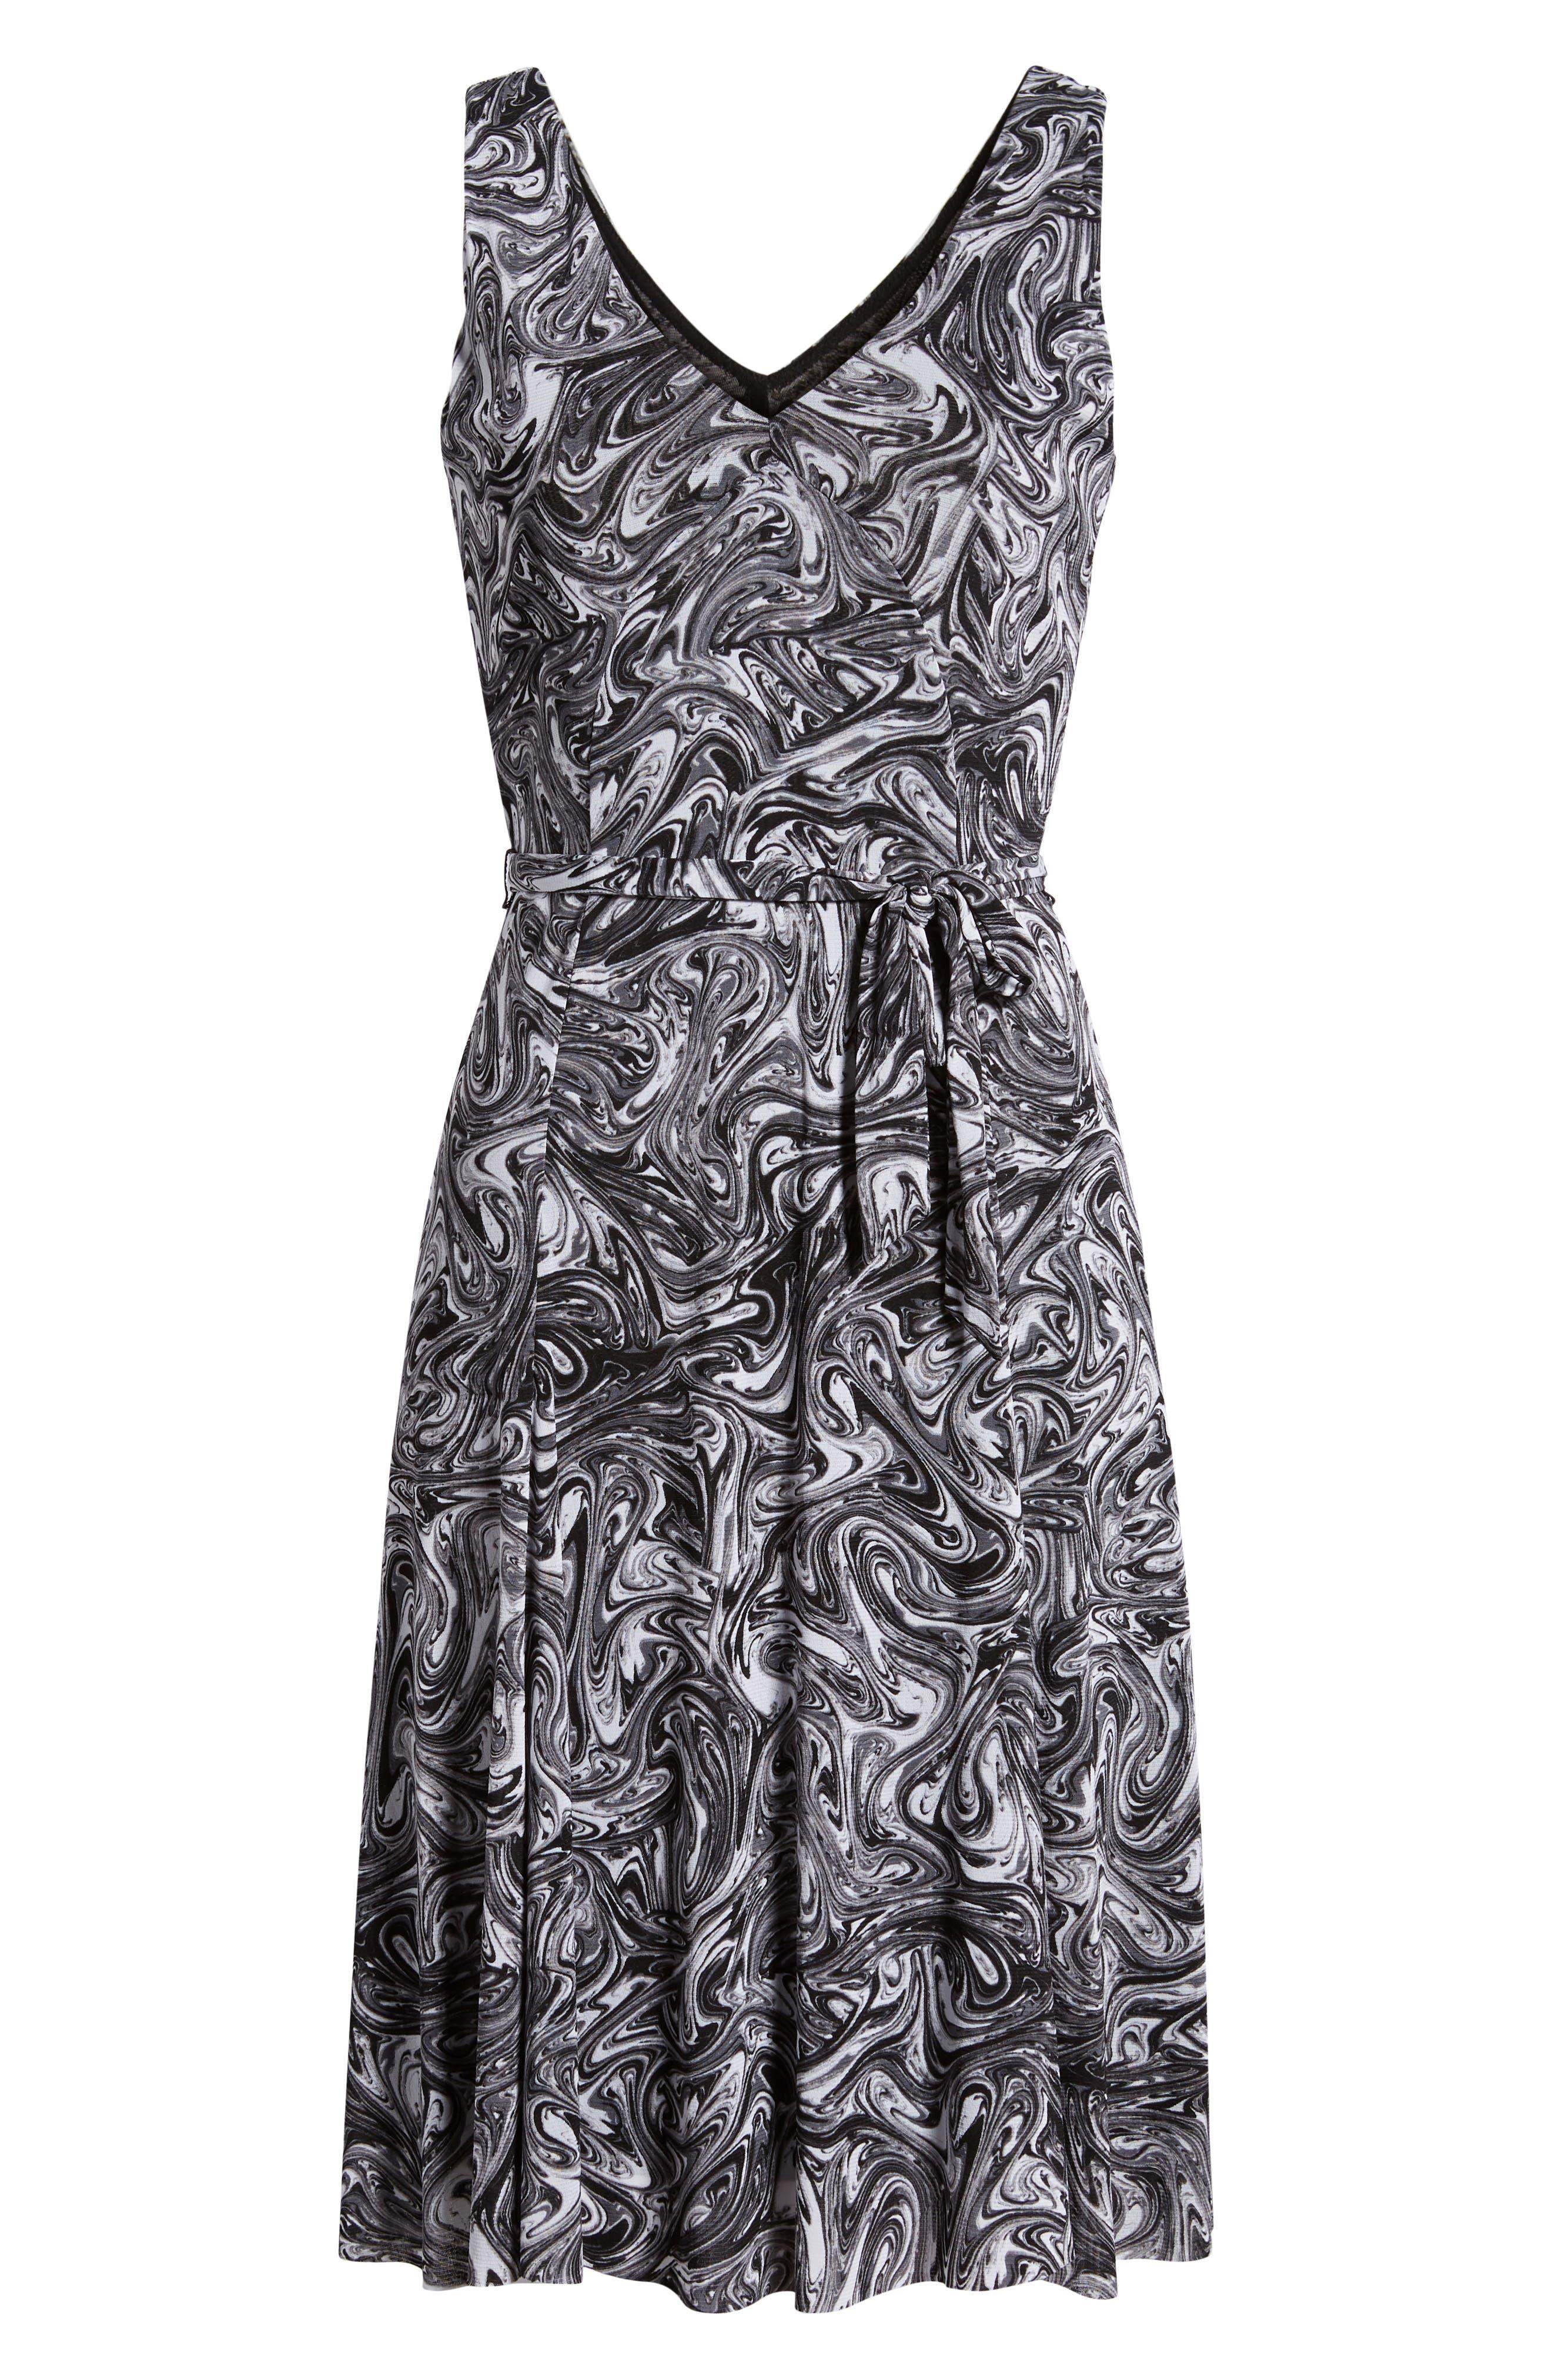 Watermark Swirl Flare Tank Dress,                             Alternate thumbnail 7, color,                             001